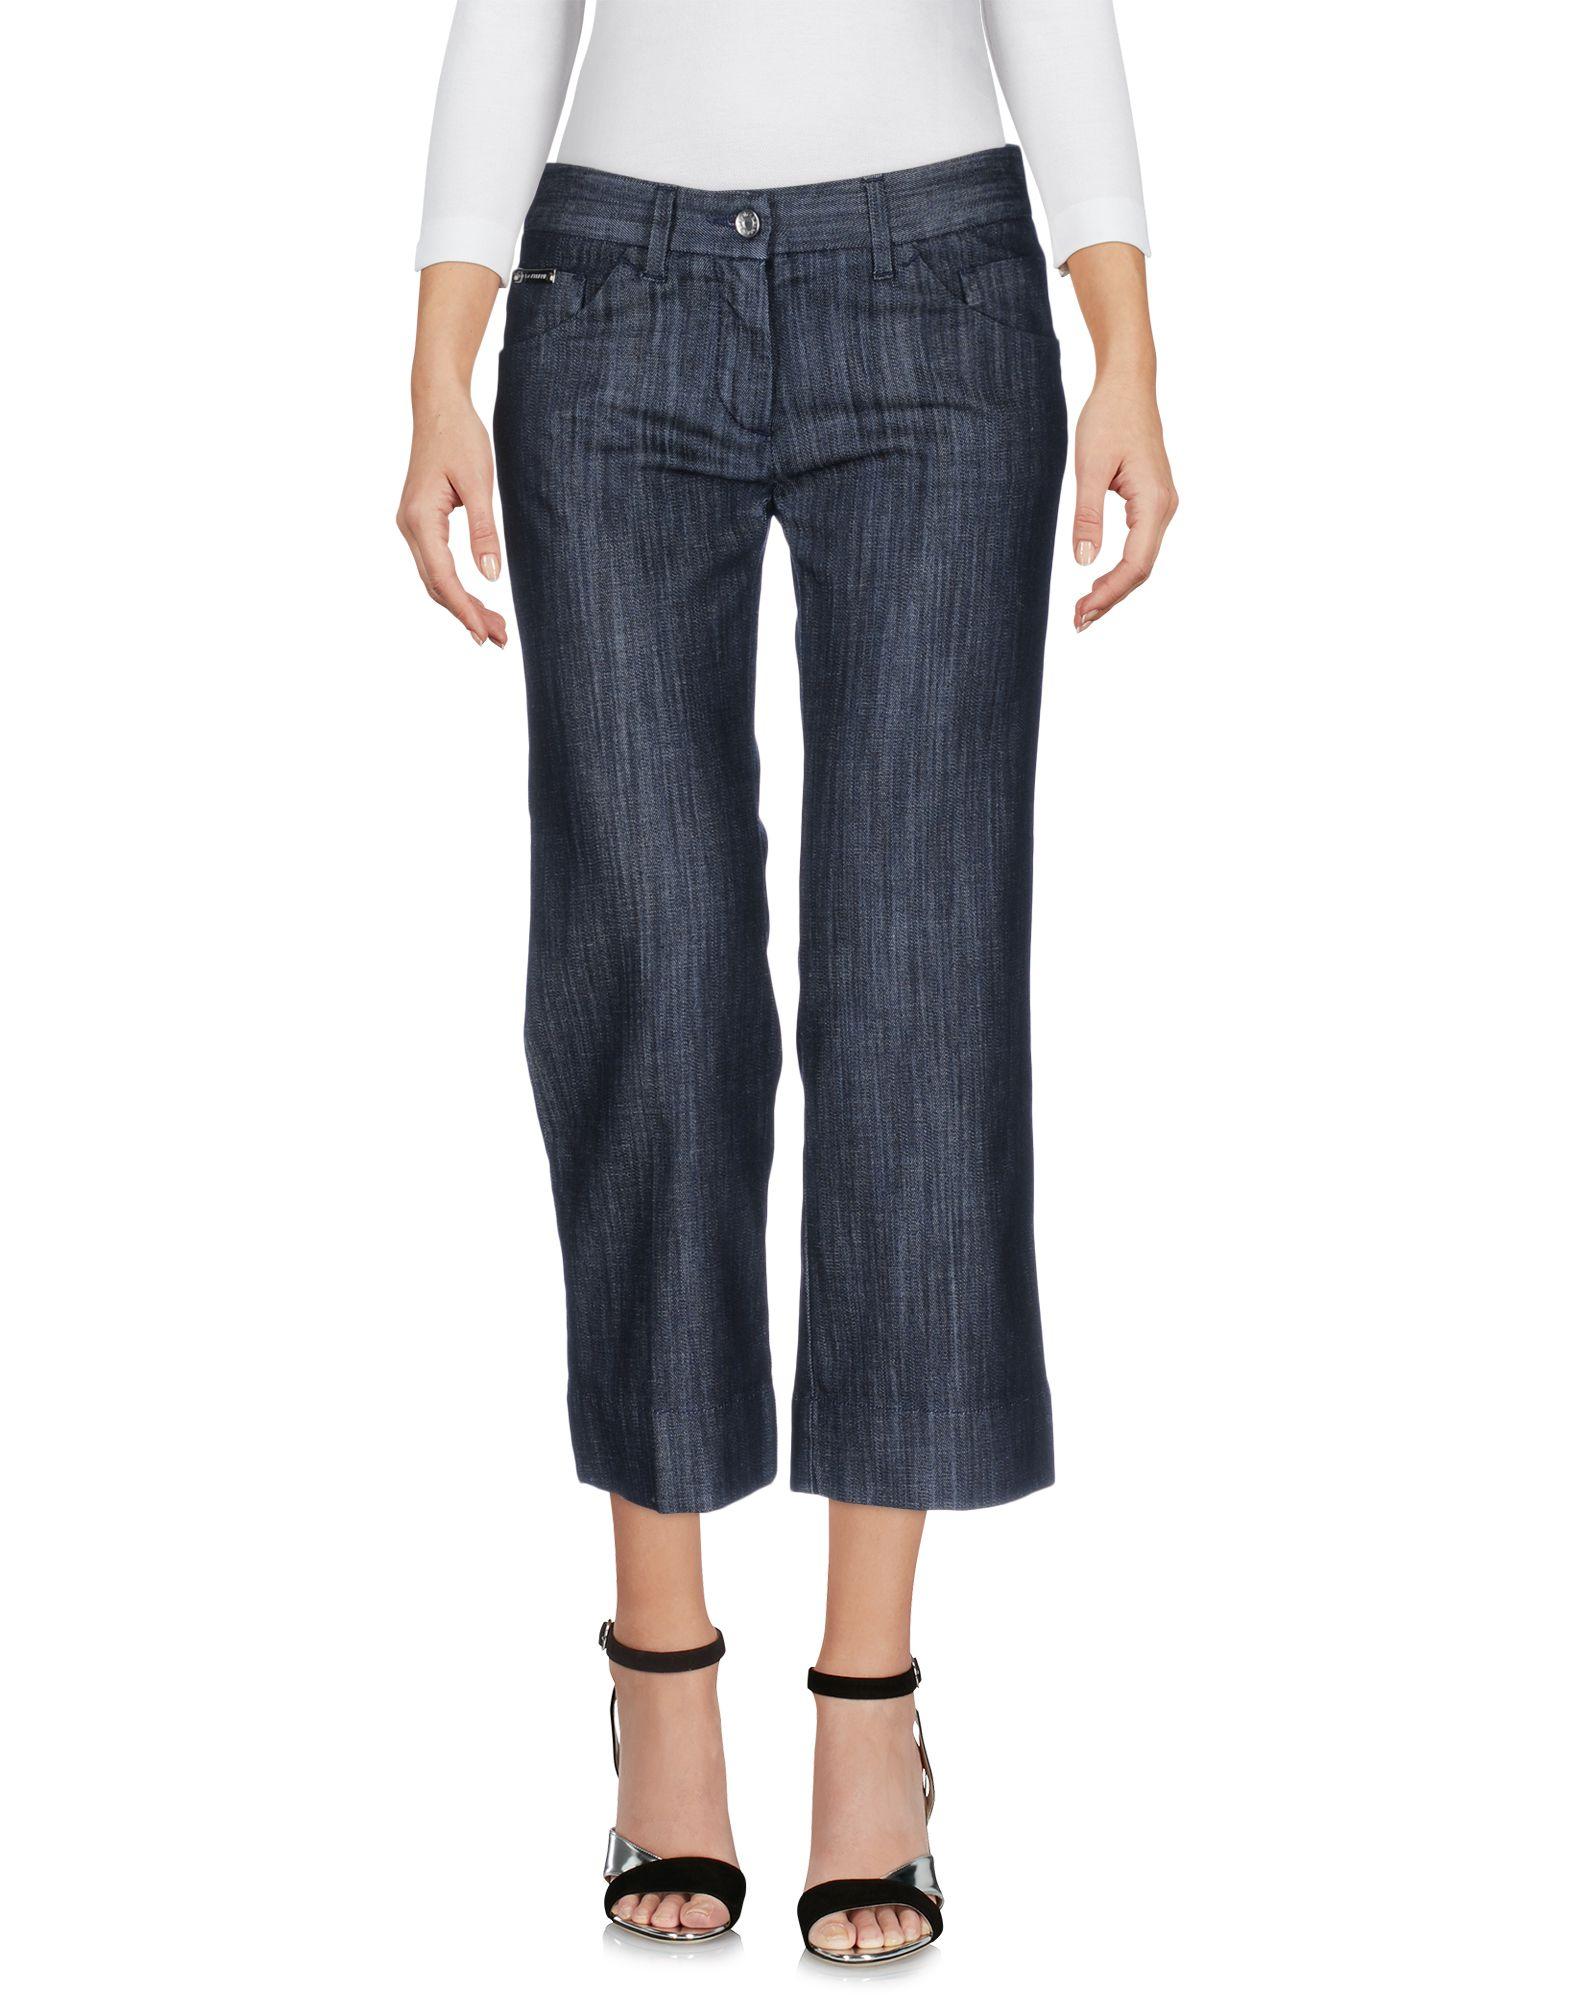 DOLCE & GABBANA Damen Jeanshose Farbe Schwarz Größe 2